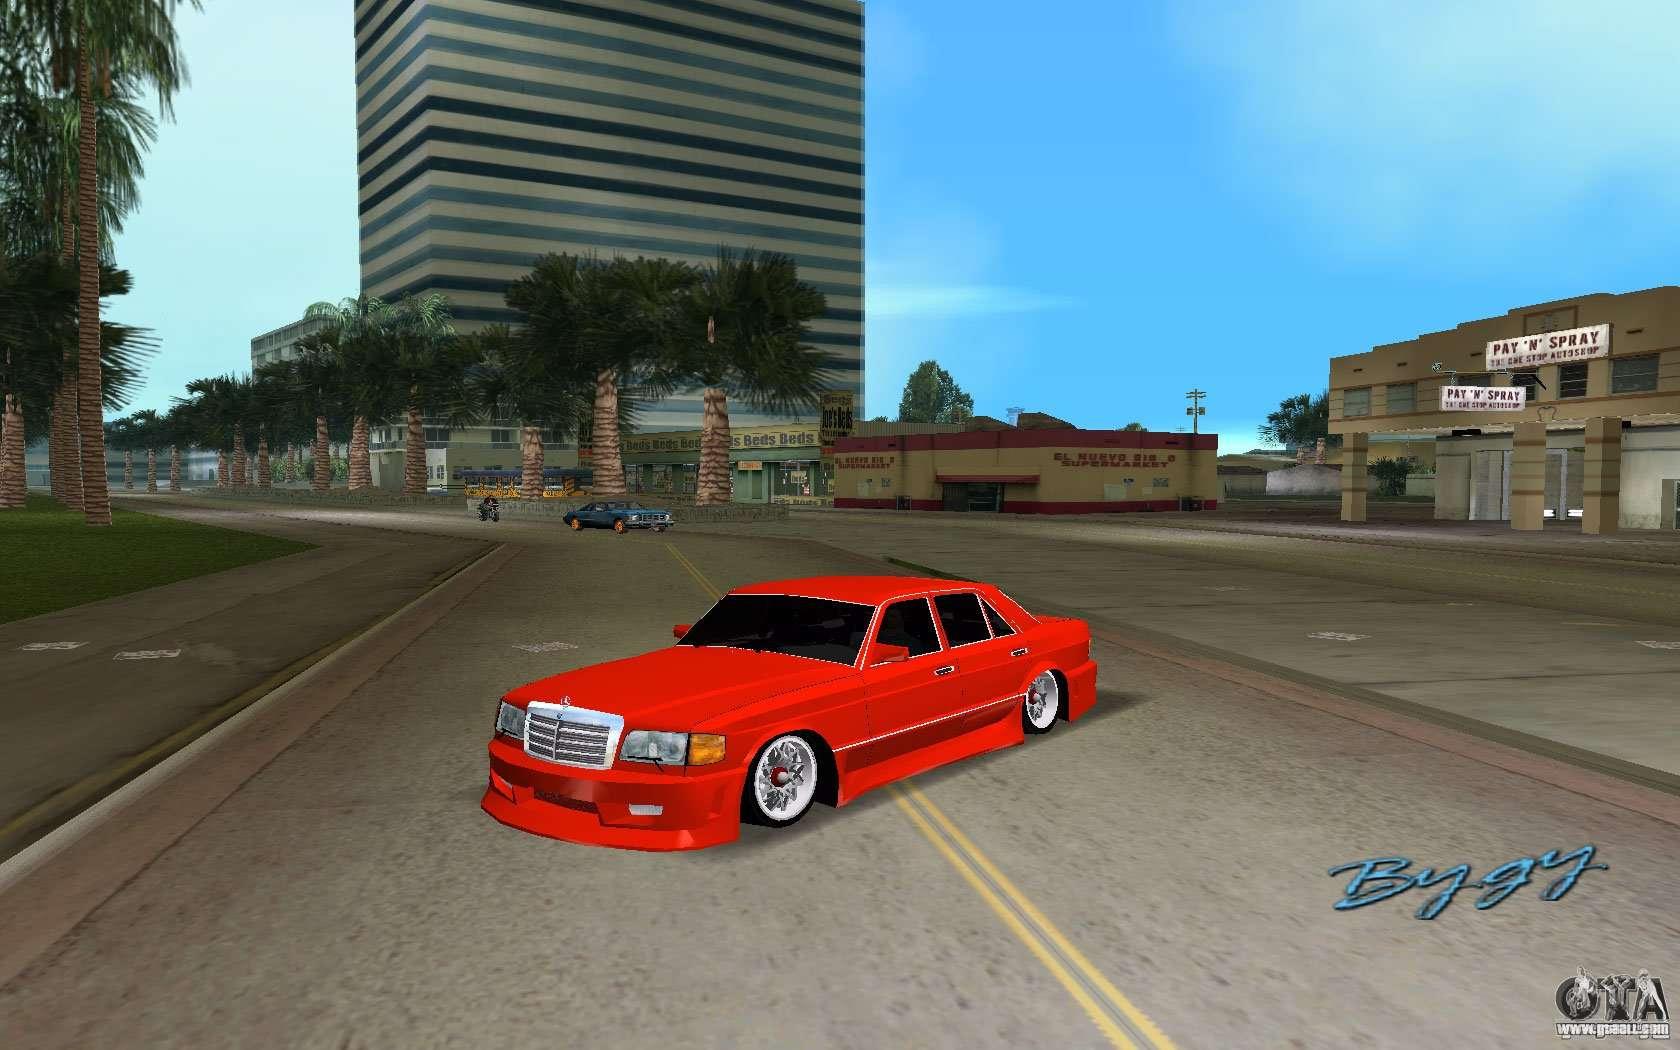 Gta Vice City Deluxo Car Location